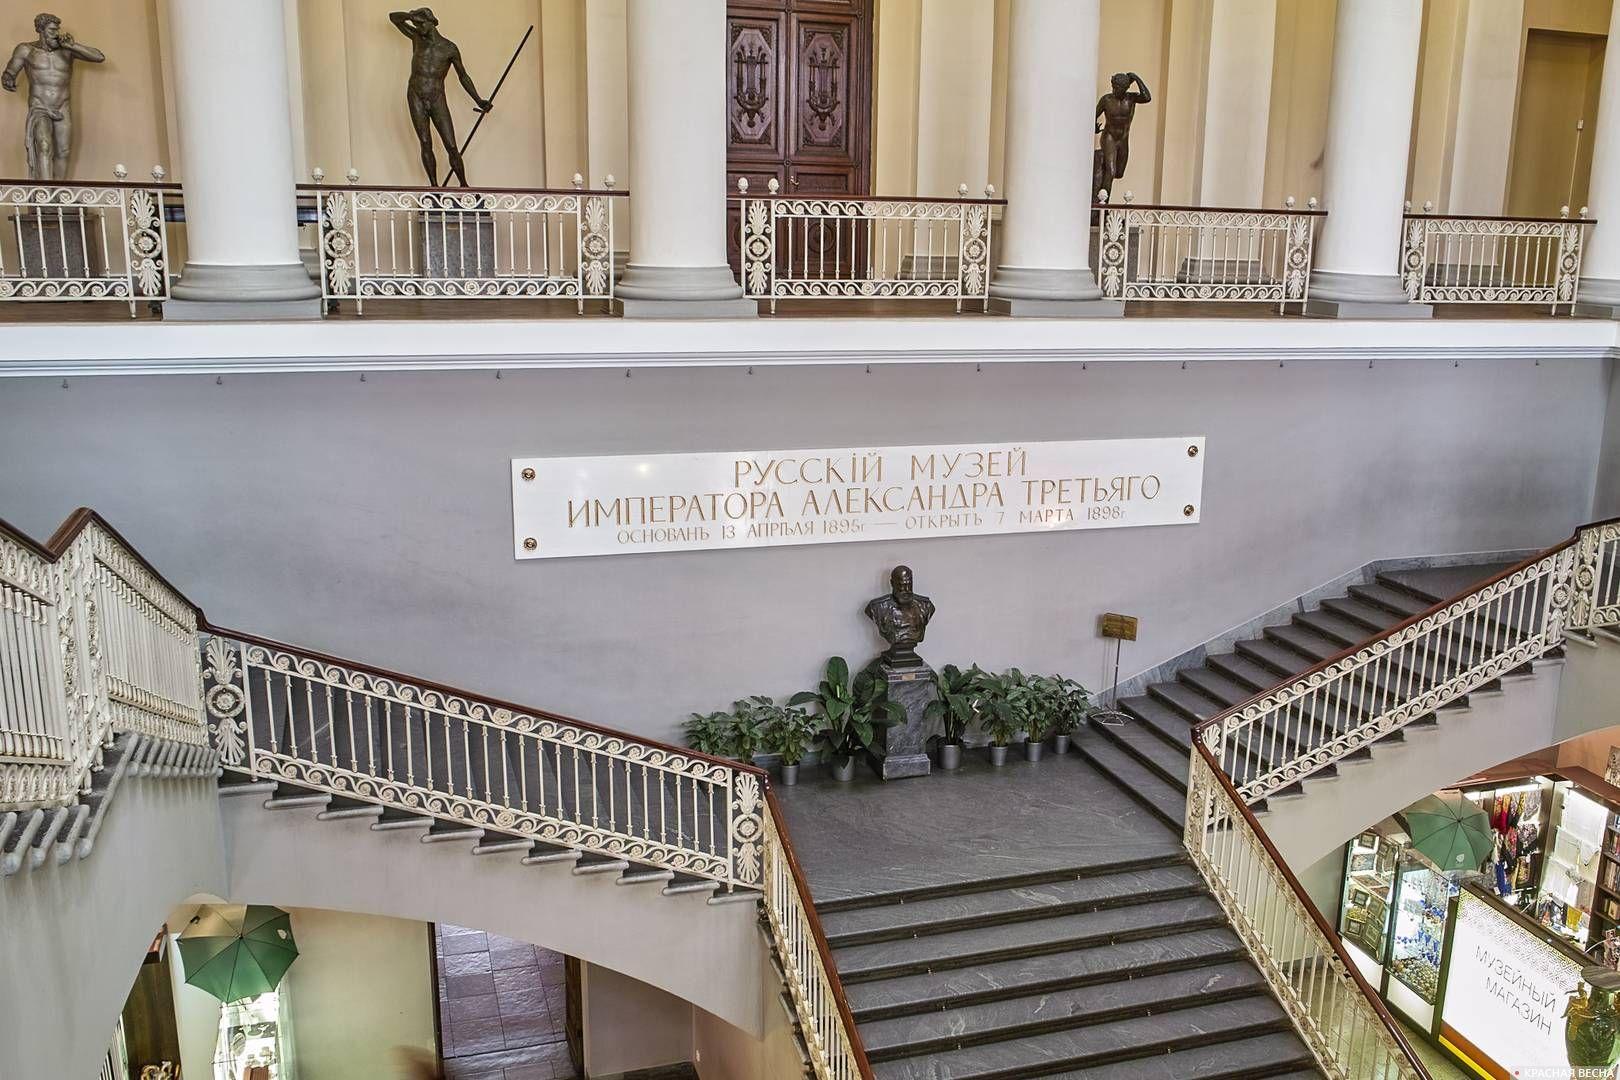 Русский музей. Санкт-Петербург. 10.2009